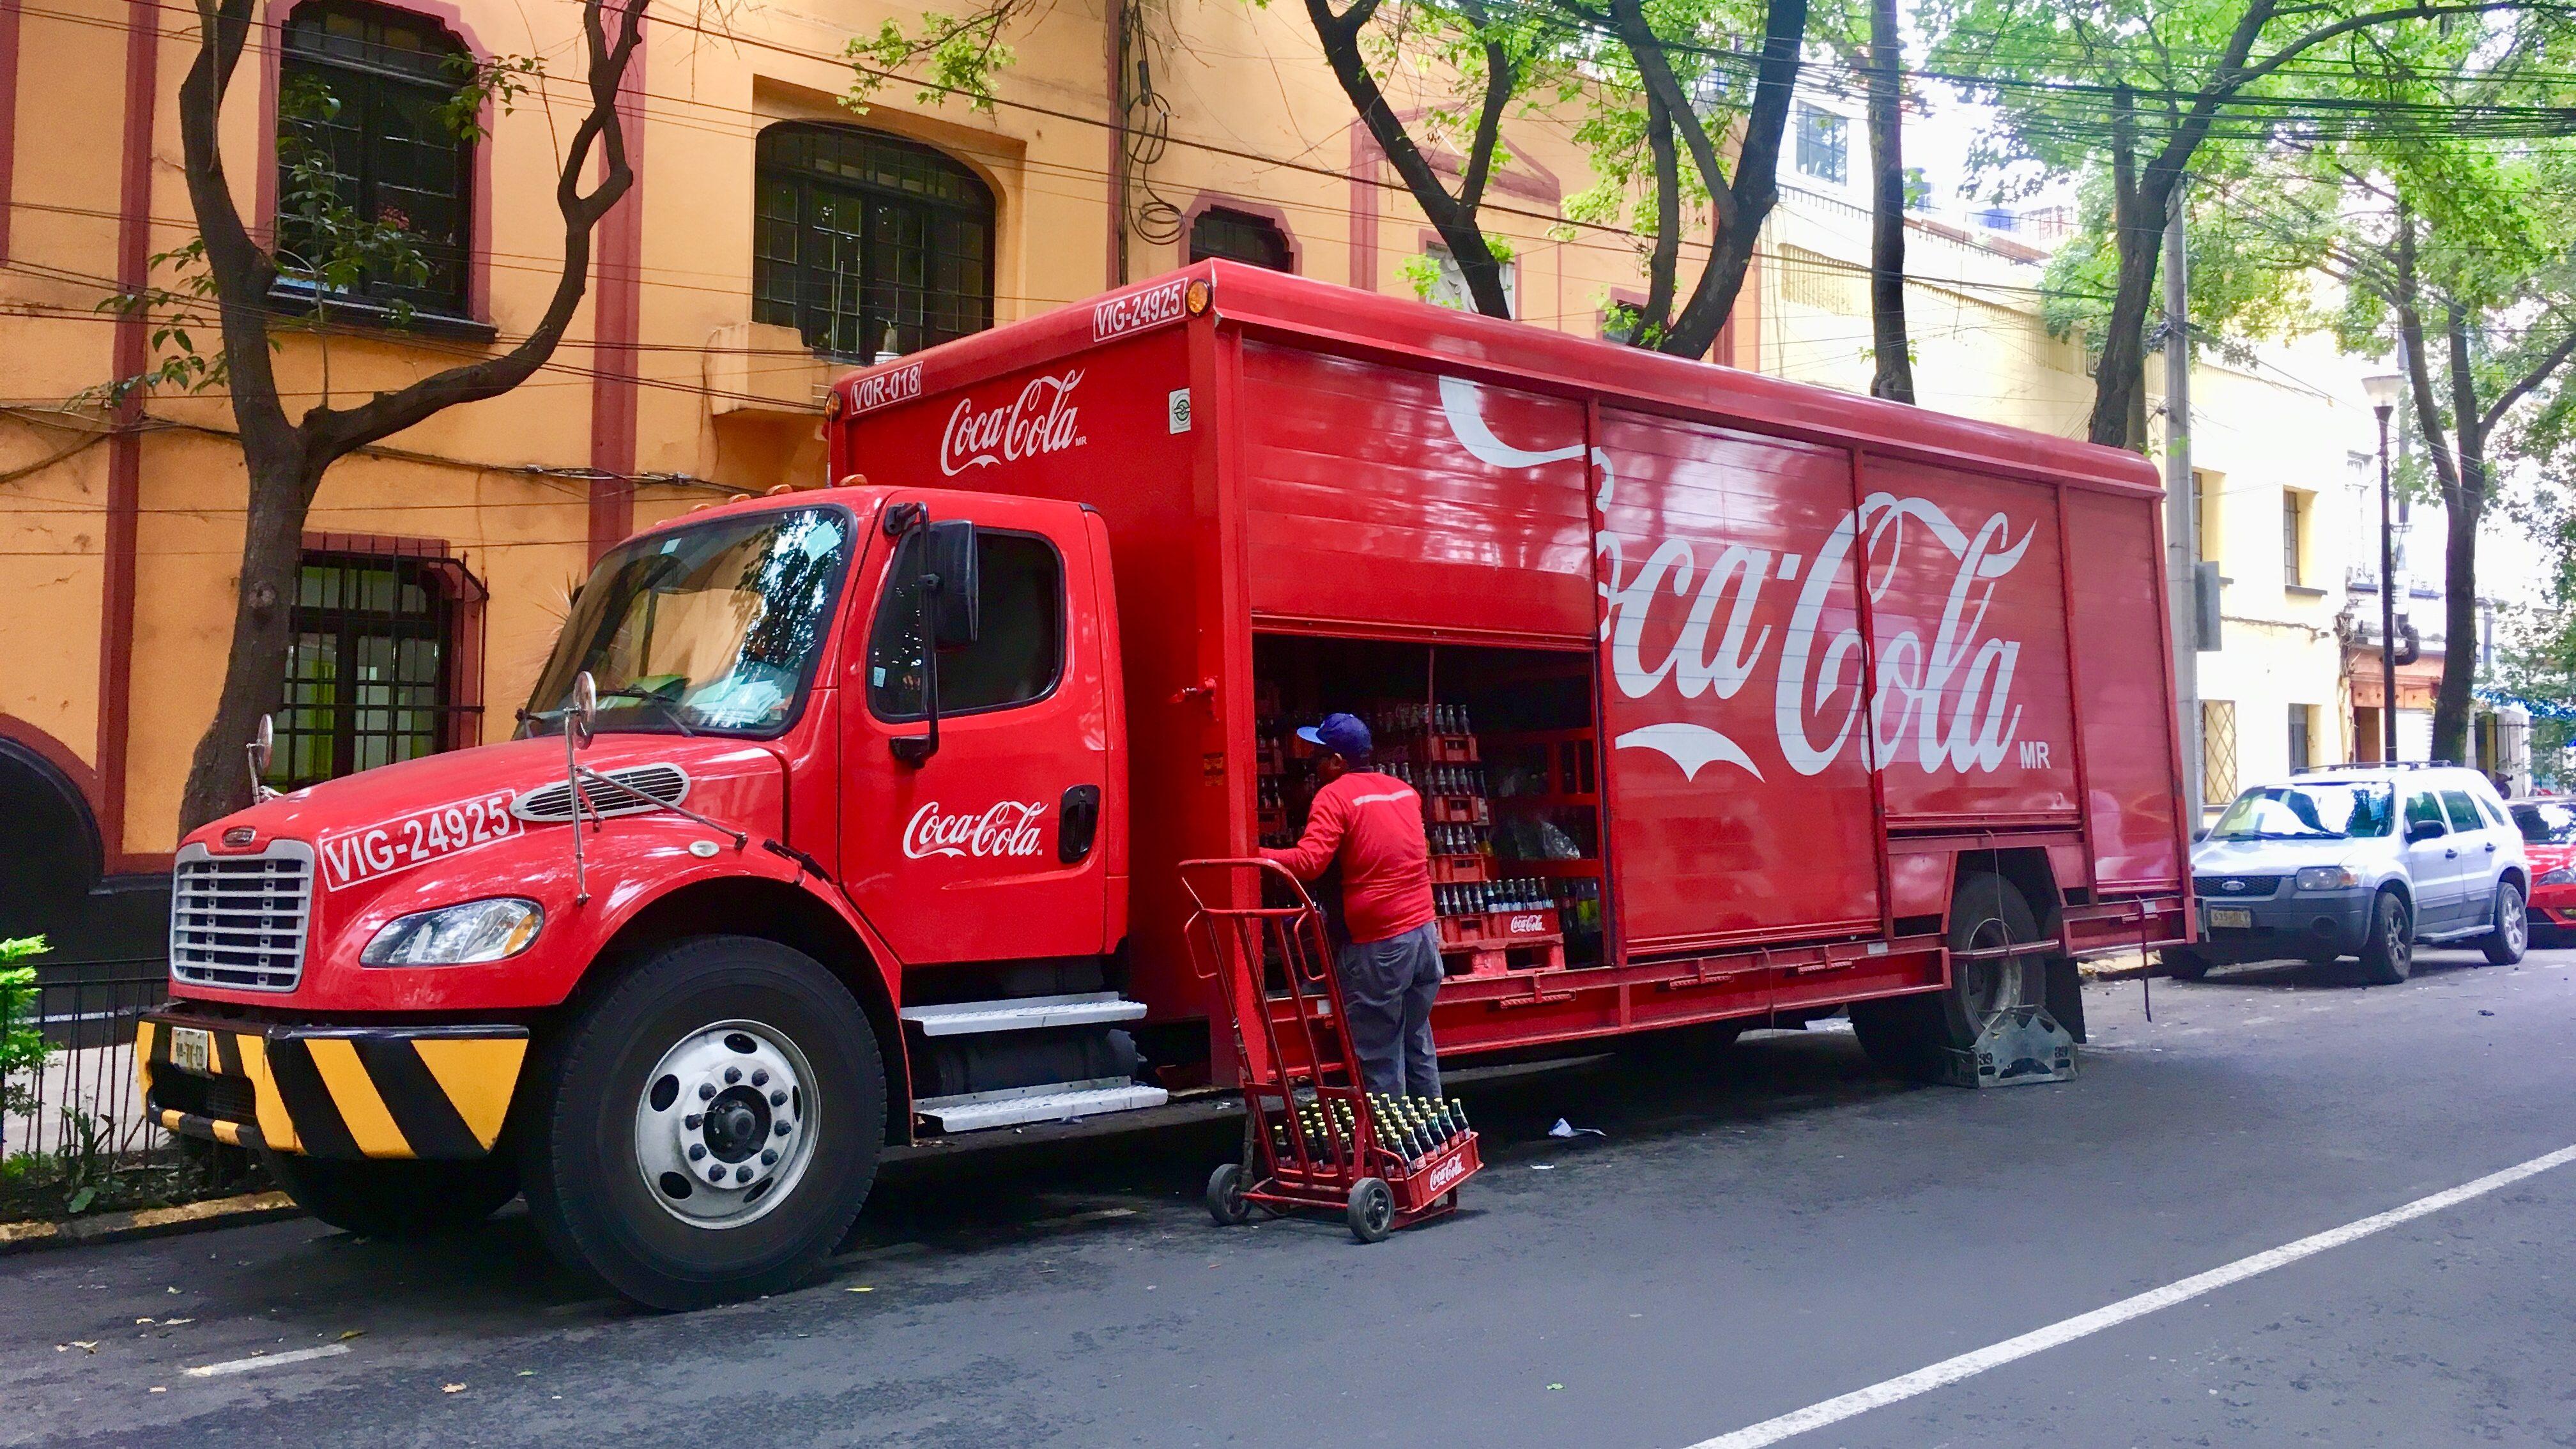 Ingresos de Coca-Cola Femsa crecen 6.7% gracias a su expansión en Latinoamérica